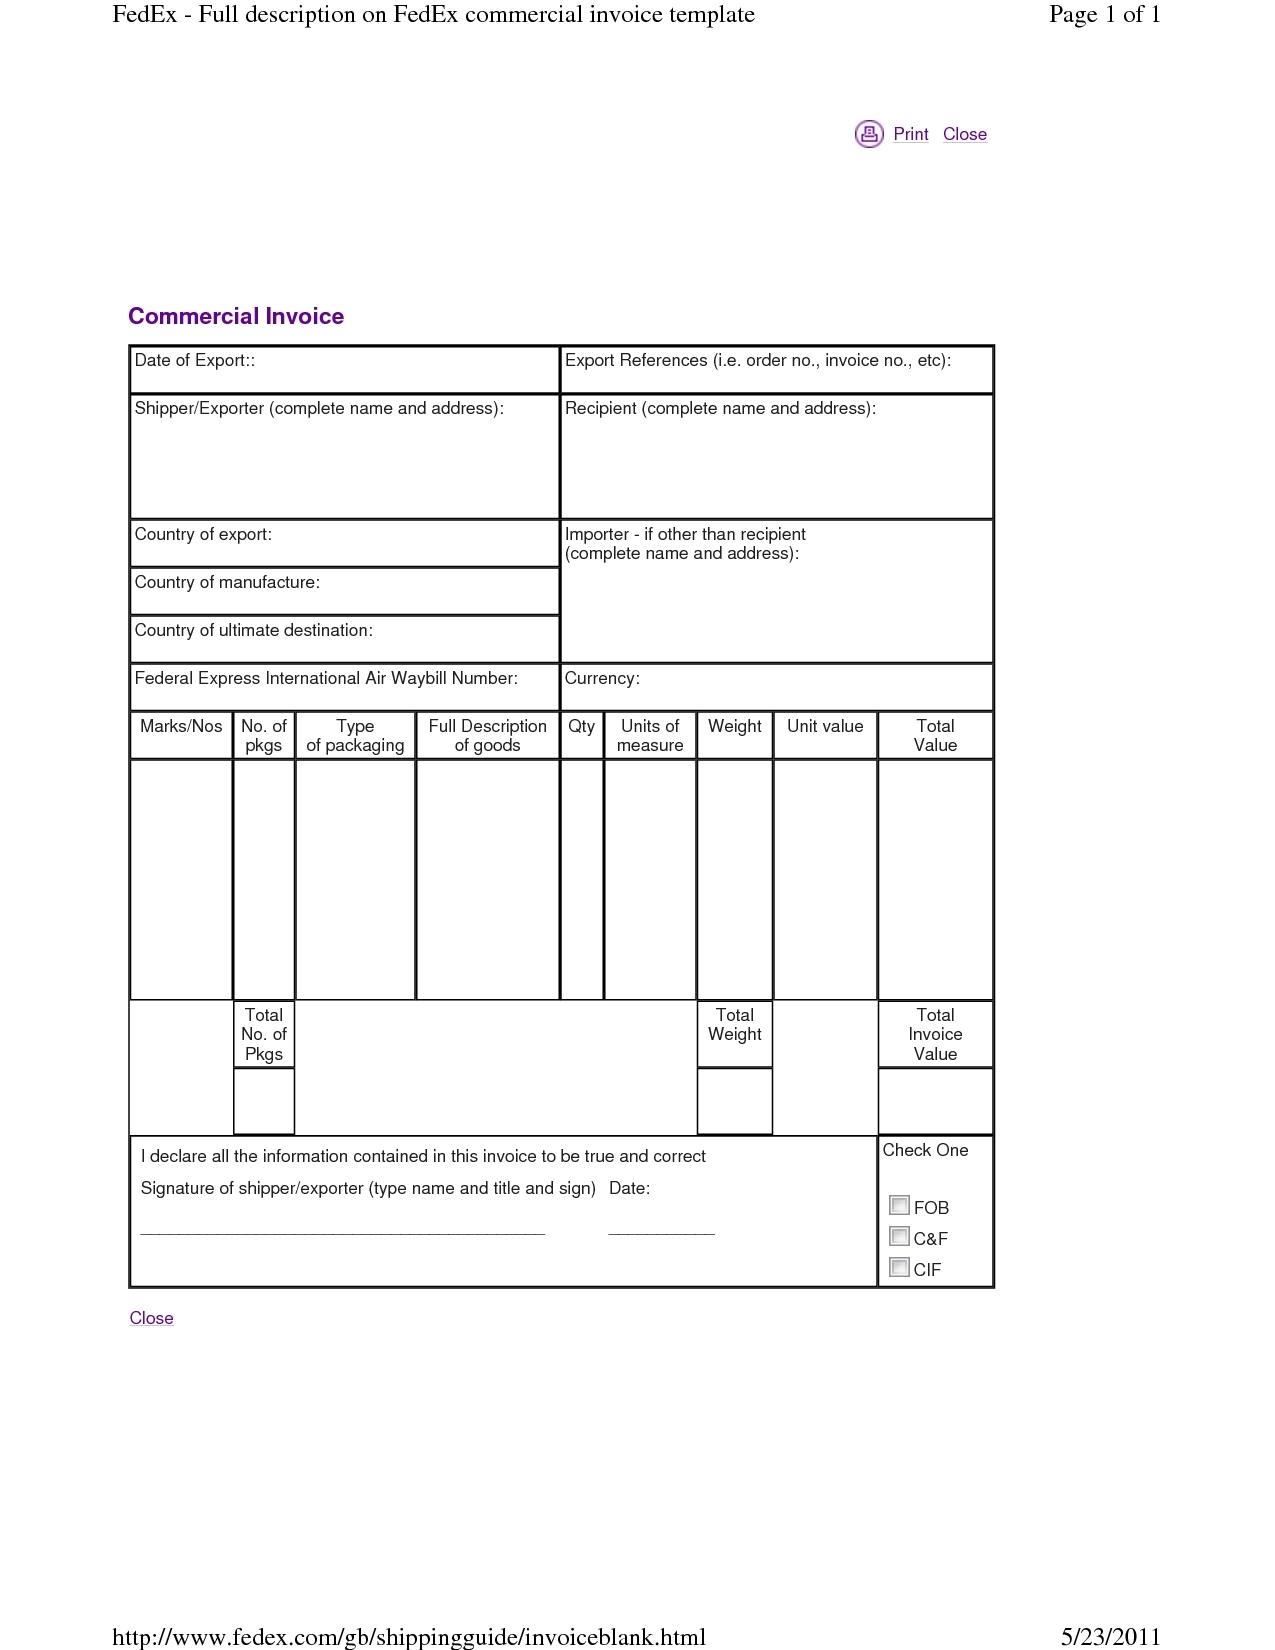 fedex proforma invoice invoice template ideas pro forma invoice fedex